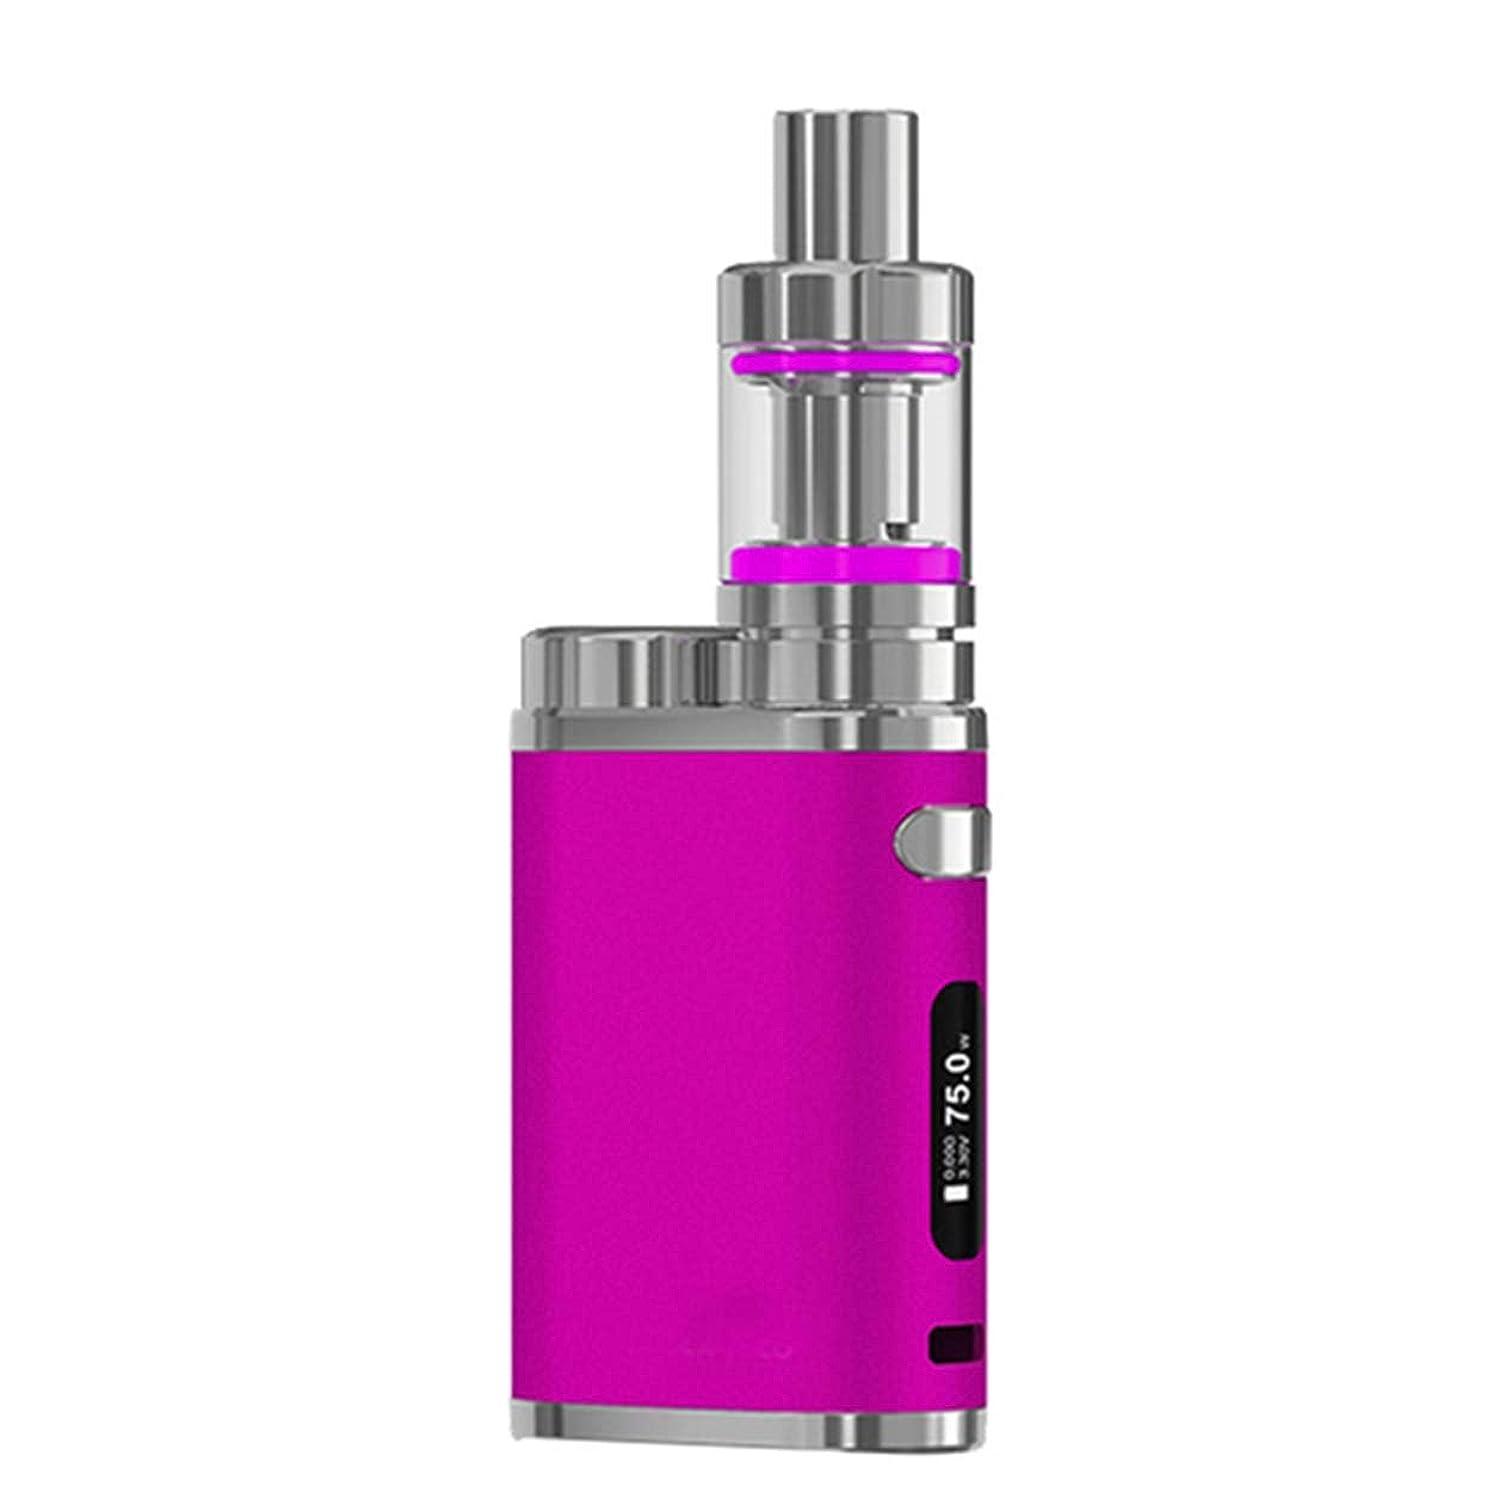 Premium Oil Bank Key Flip Style | Relaxtion Inhaler airis QUTE Premium Slim Oil Diffuser Pen … (Pink)